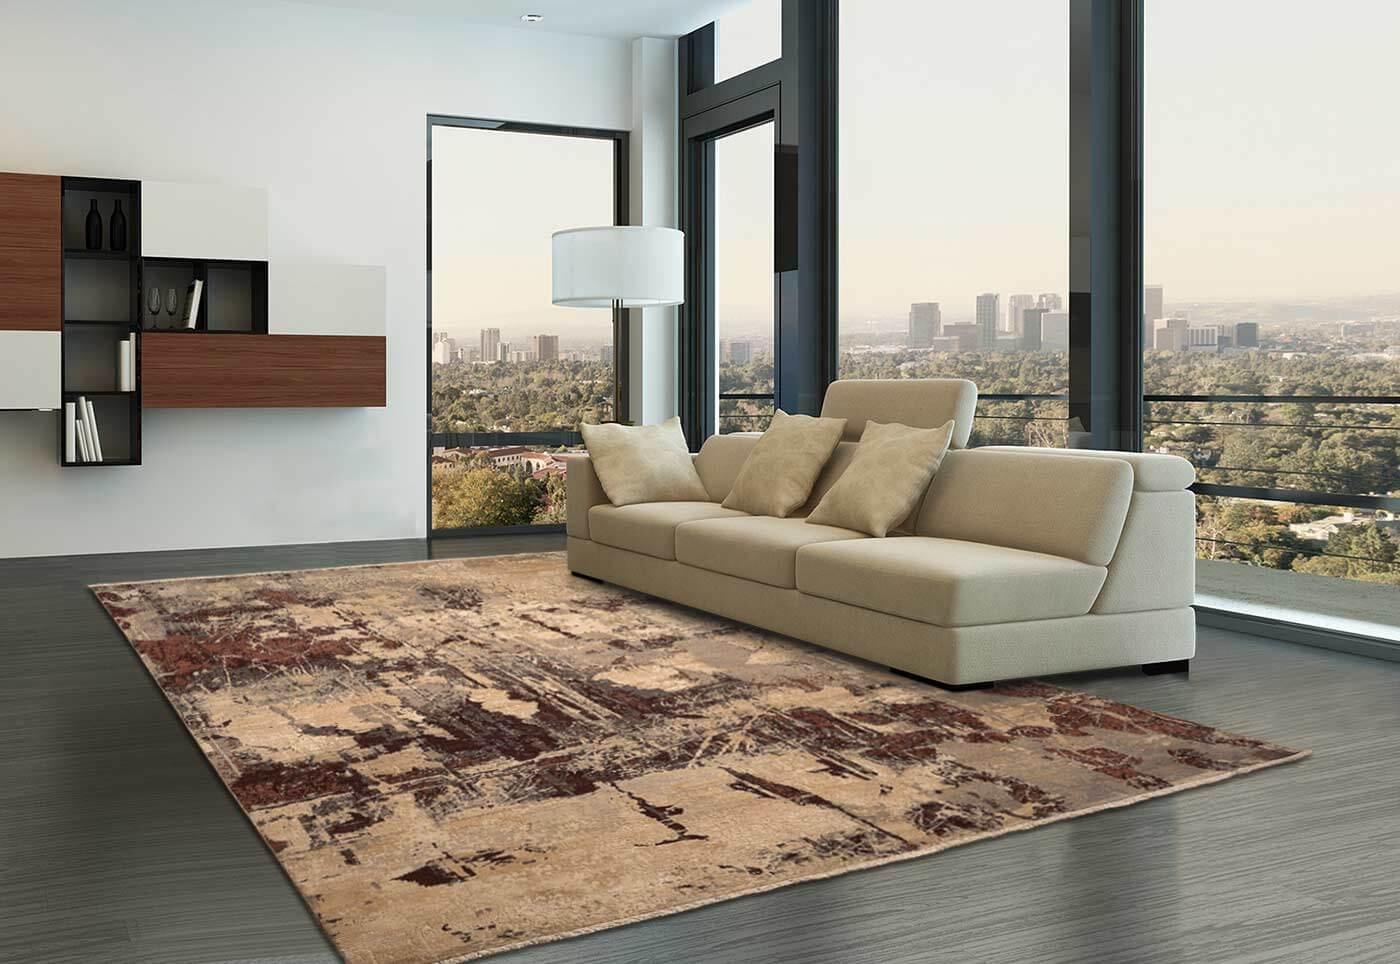 avant-garde-alchemy-tapijt-modern-design-tapijten-interieur2